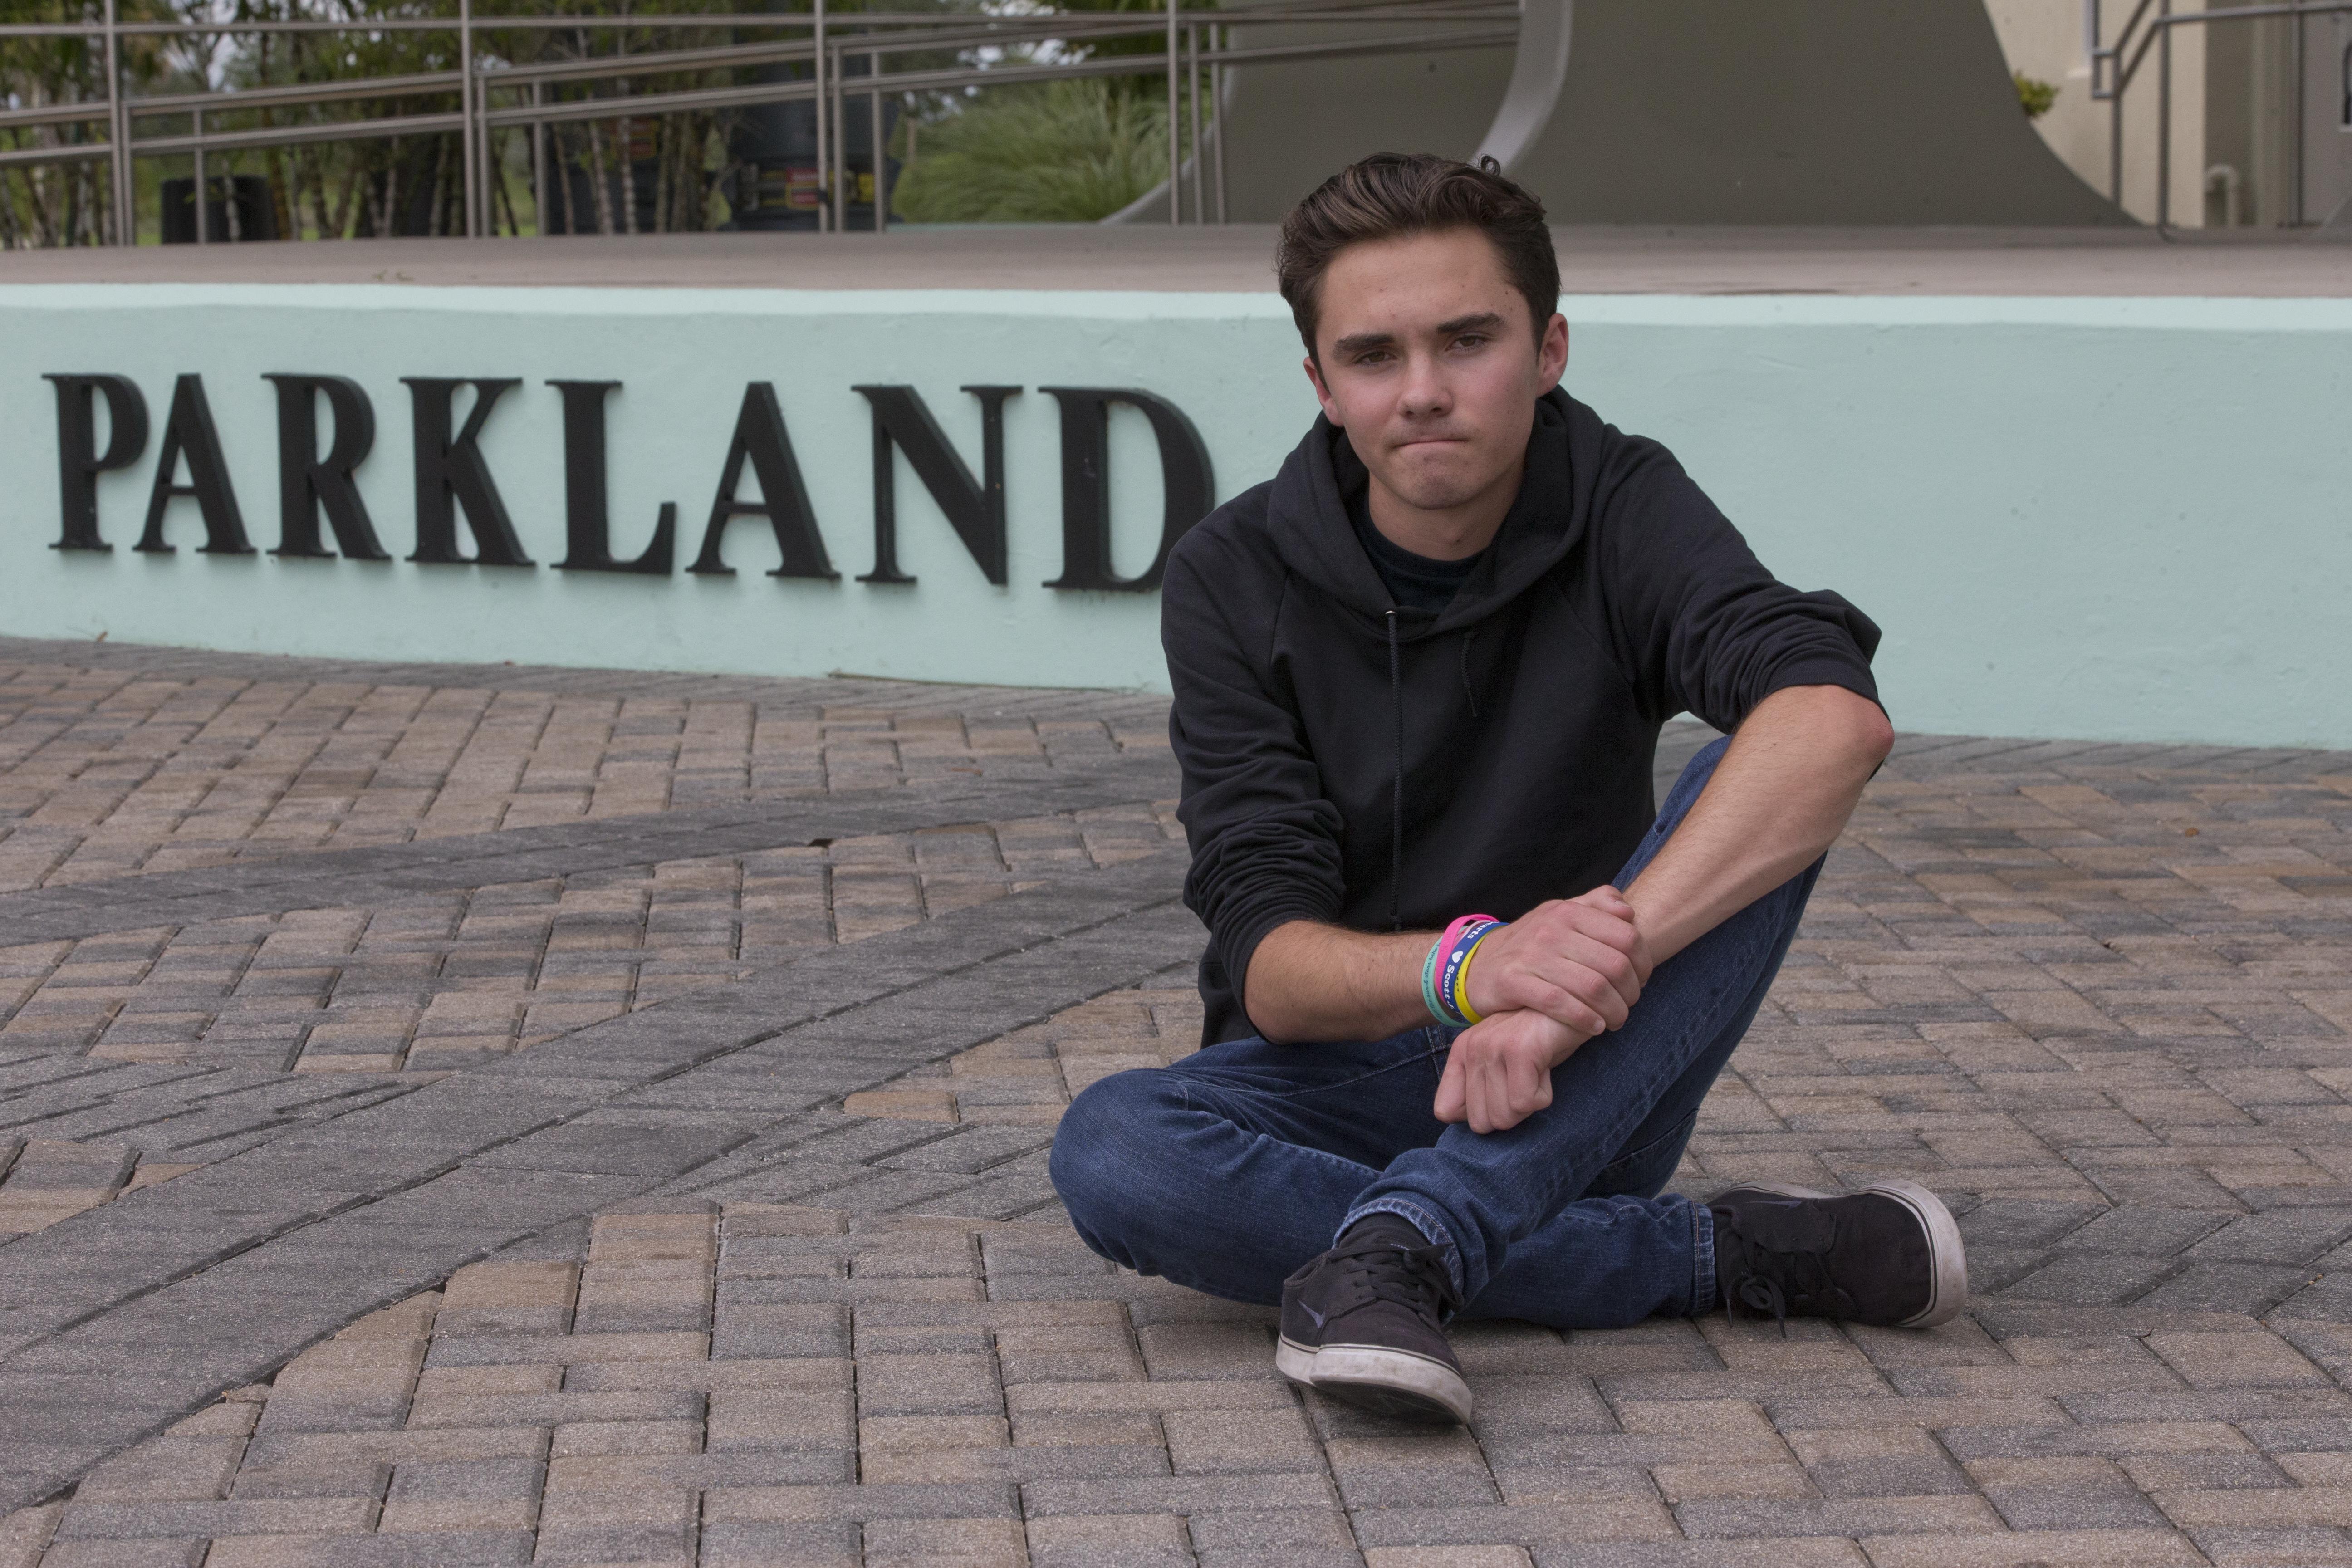 swat swarms home of parkland student activist david hogg after a